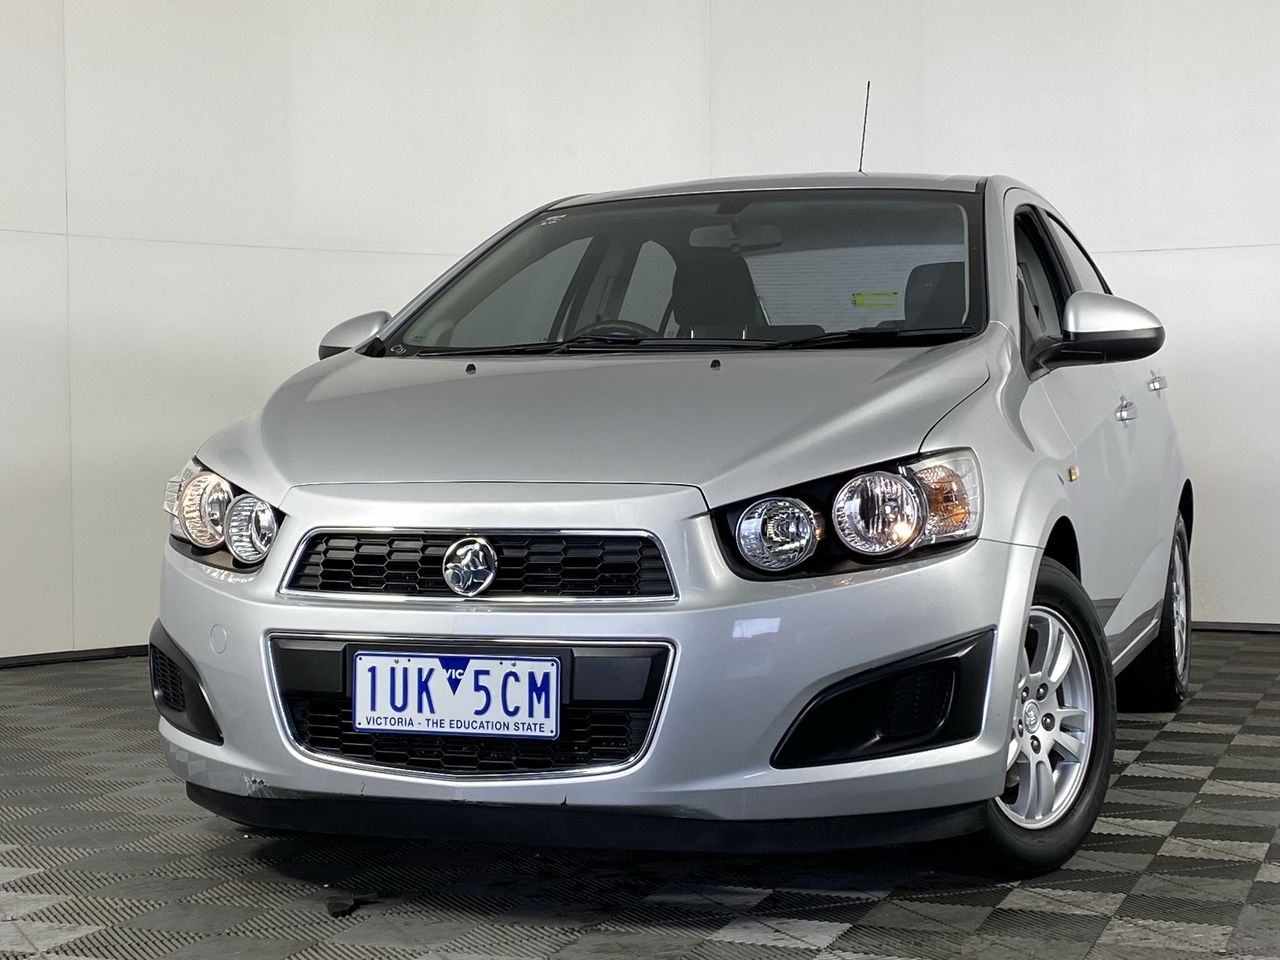 2014 Holden Barina TM Automatic Sedan - 45244km only